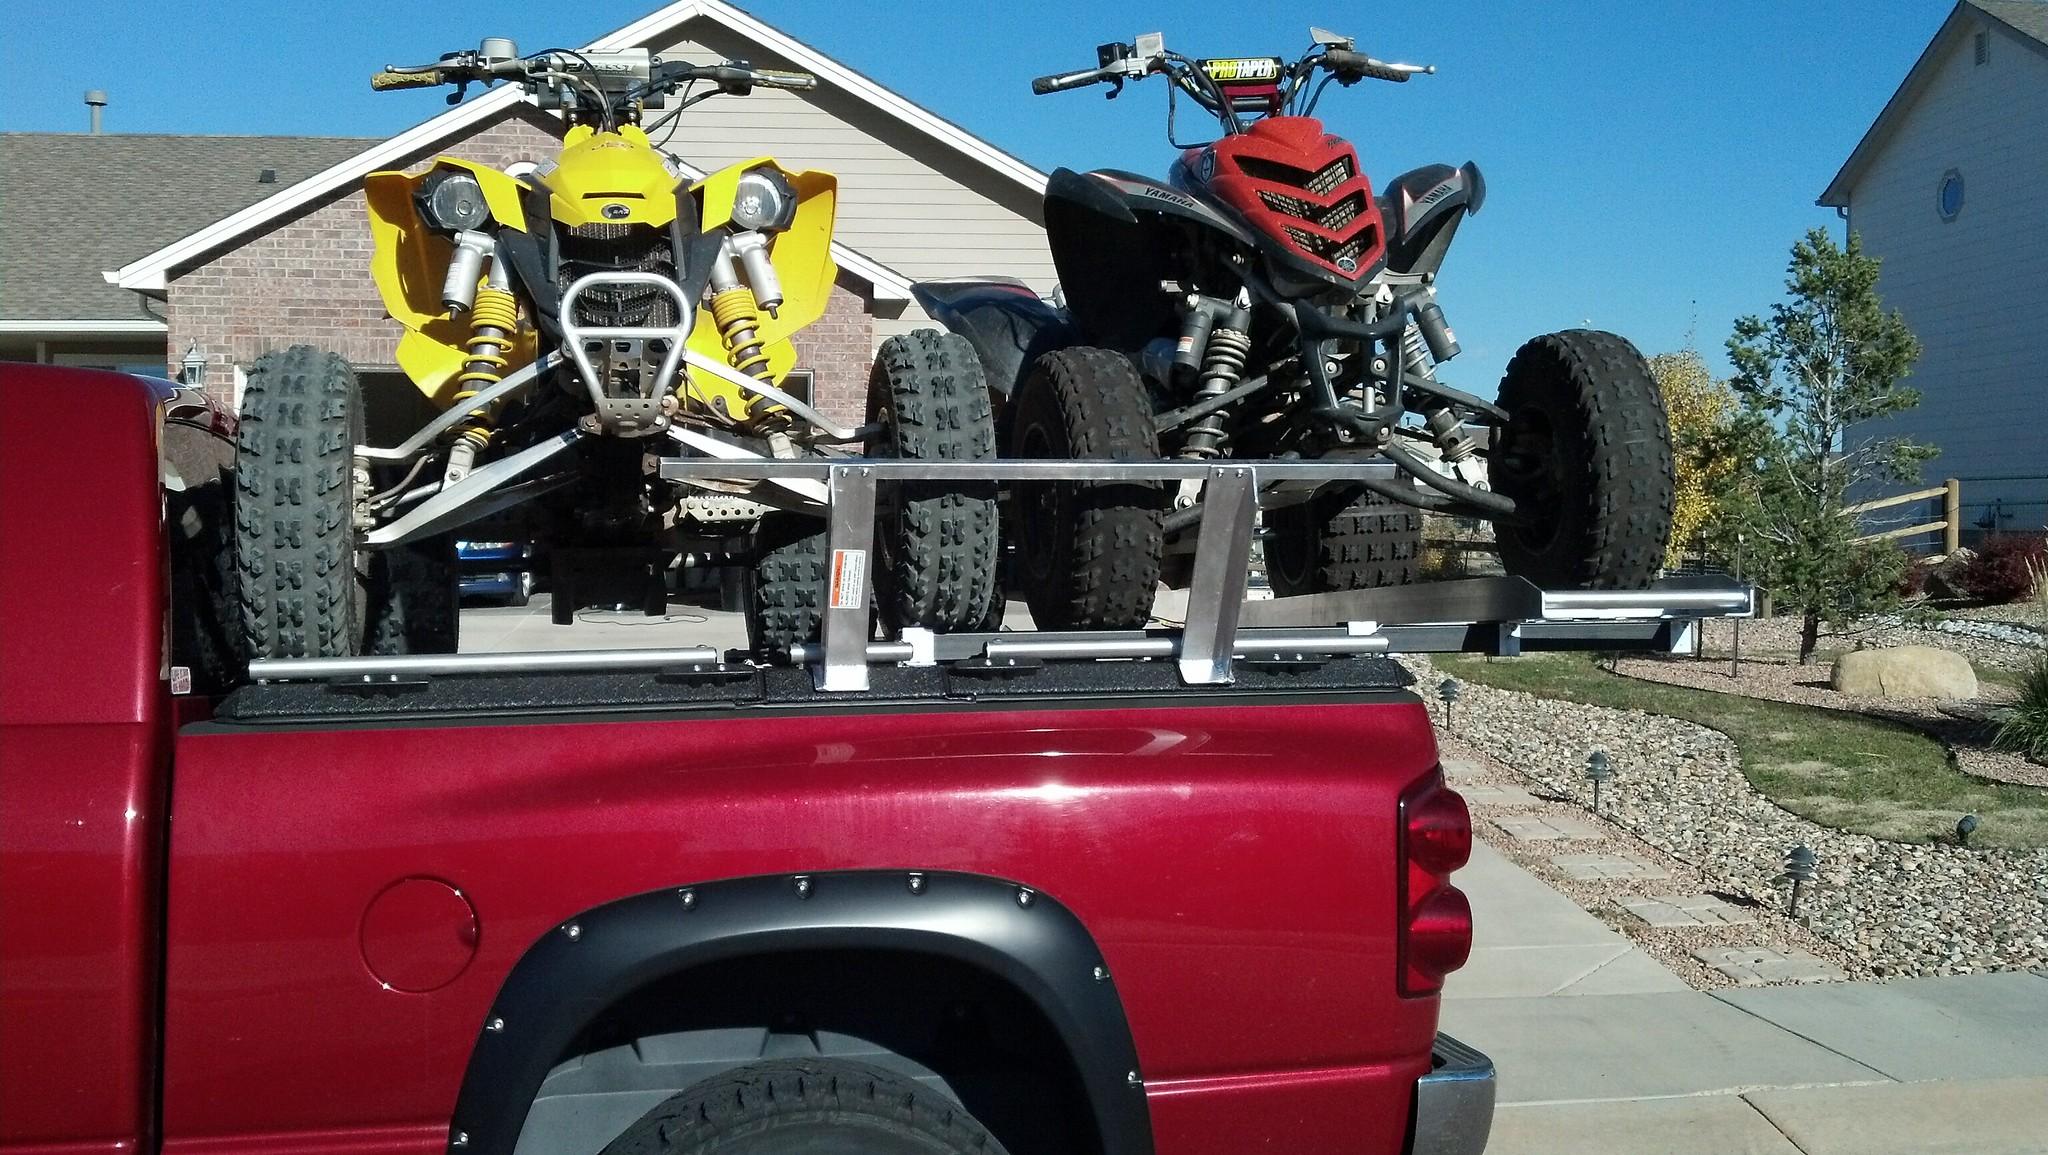 Truck Fender Flares >> ATV Truck Rack on Dodge Ram Pickup   Flickr - Photo Sharing!